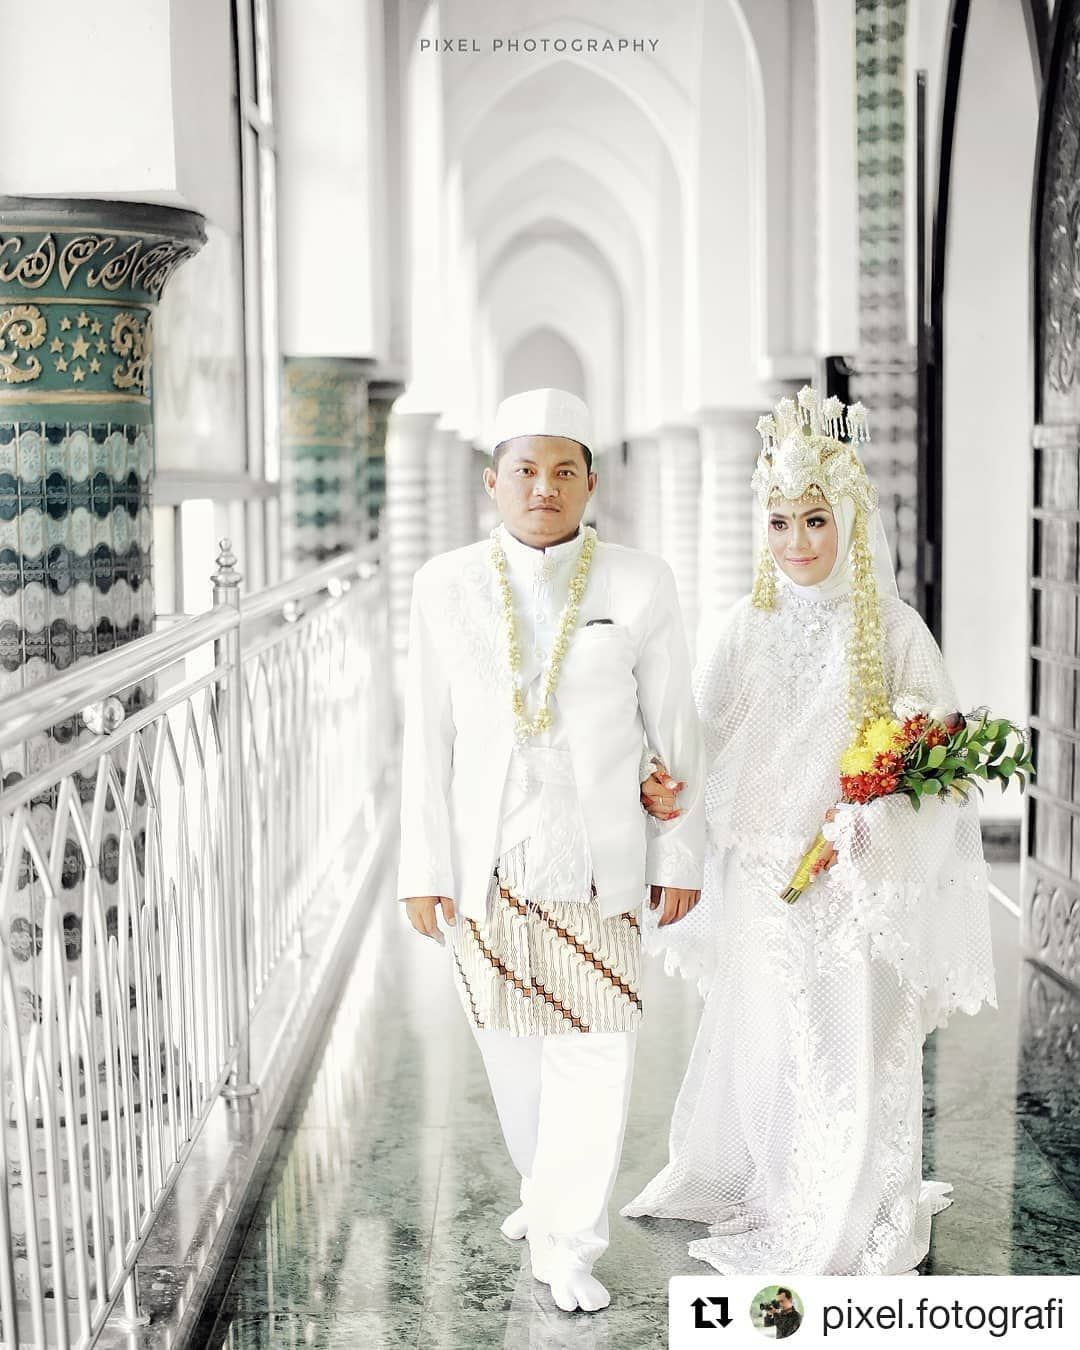 Sesuai Riquest Kak Catherin Alfi Hijab Syar I Siger Sunda Gown Mua By Yustika Syarief Re Wedding Organization Sweet Potato Soup Recipes French 75 Cocktail